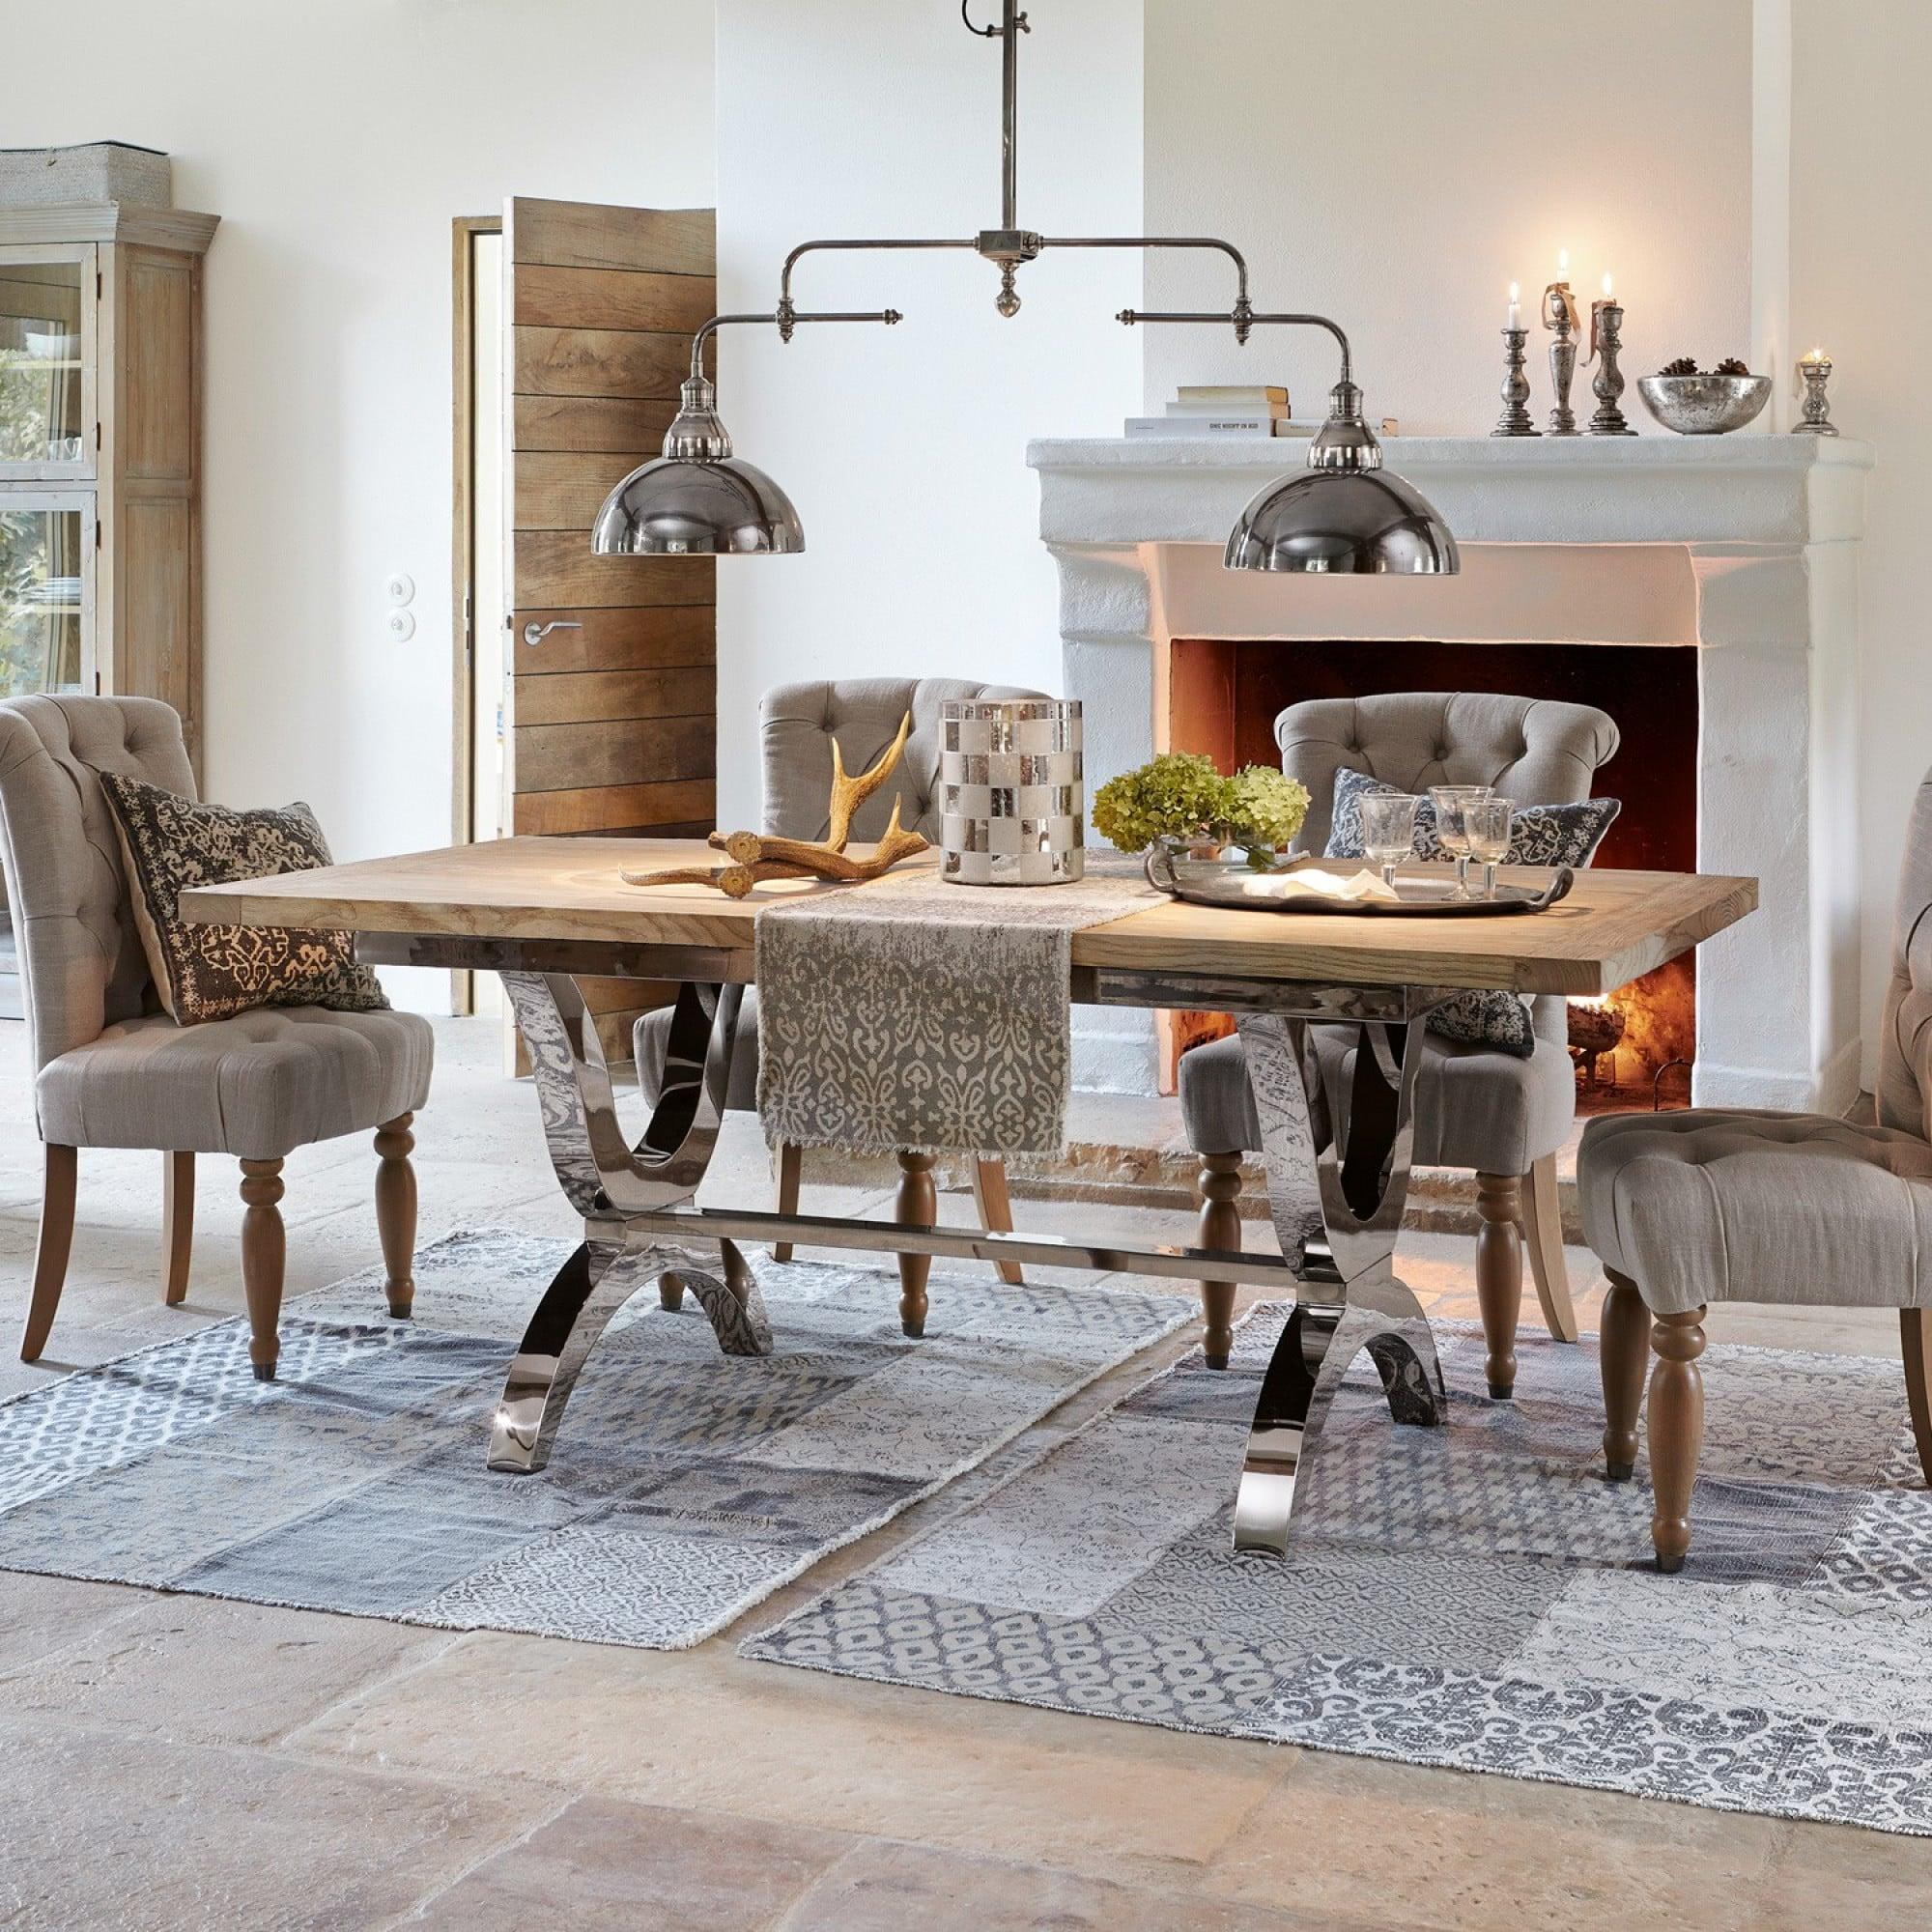 tisch grover loberon coming home. Black Bedroom Furniture Sets. Home Design Ideas